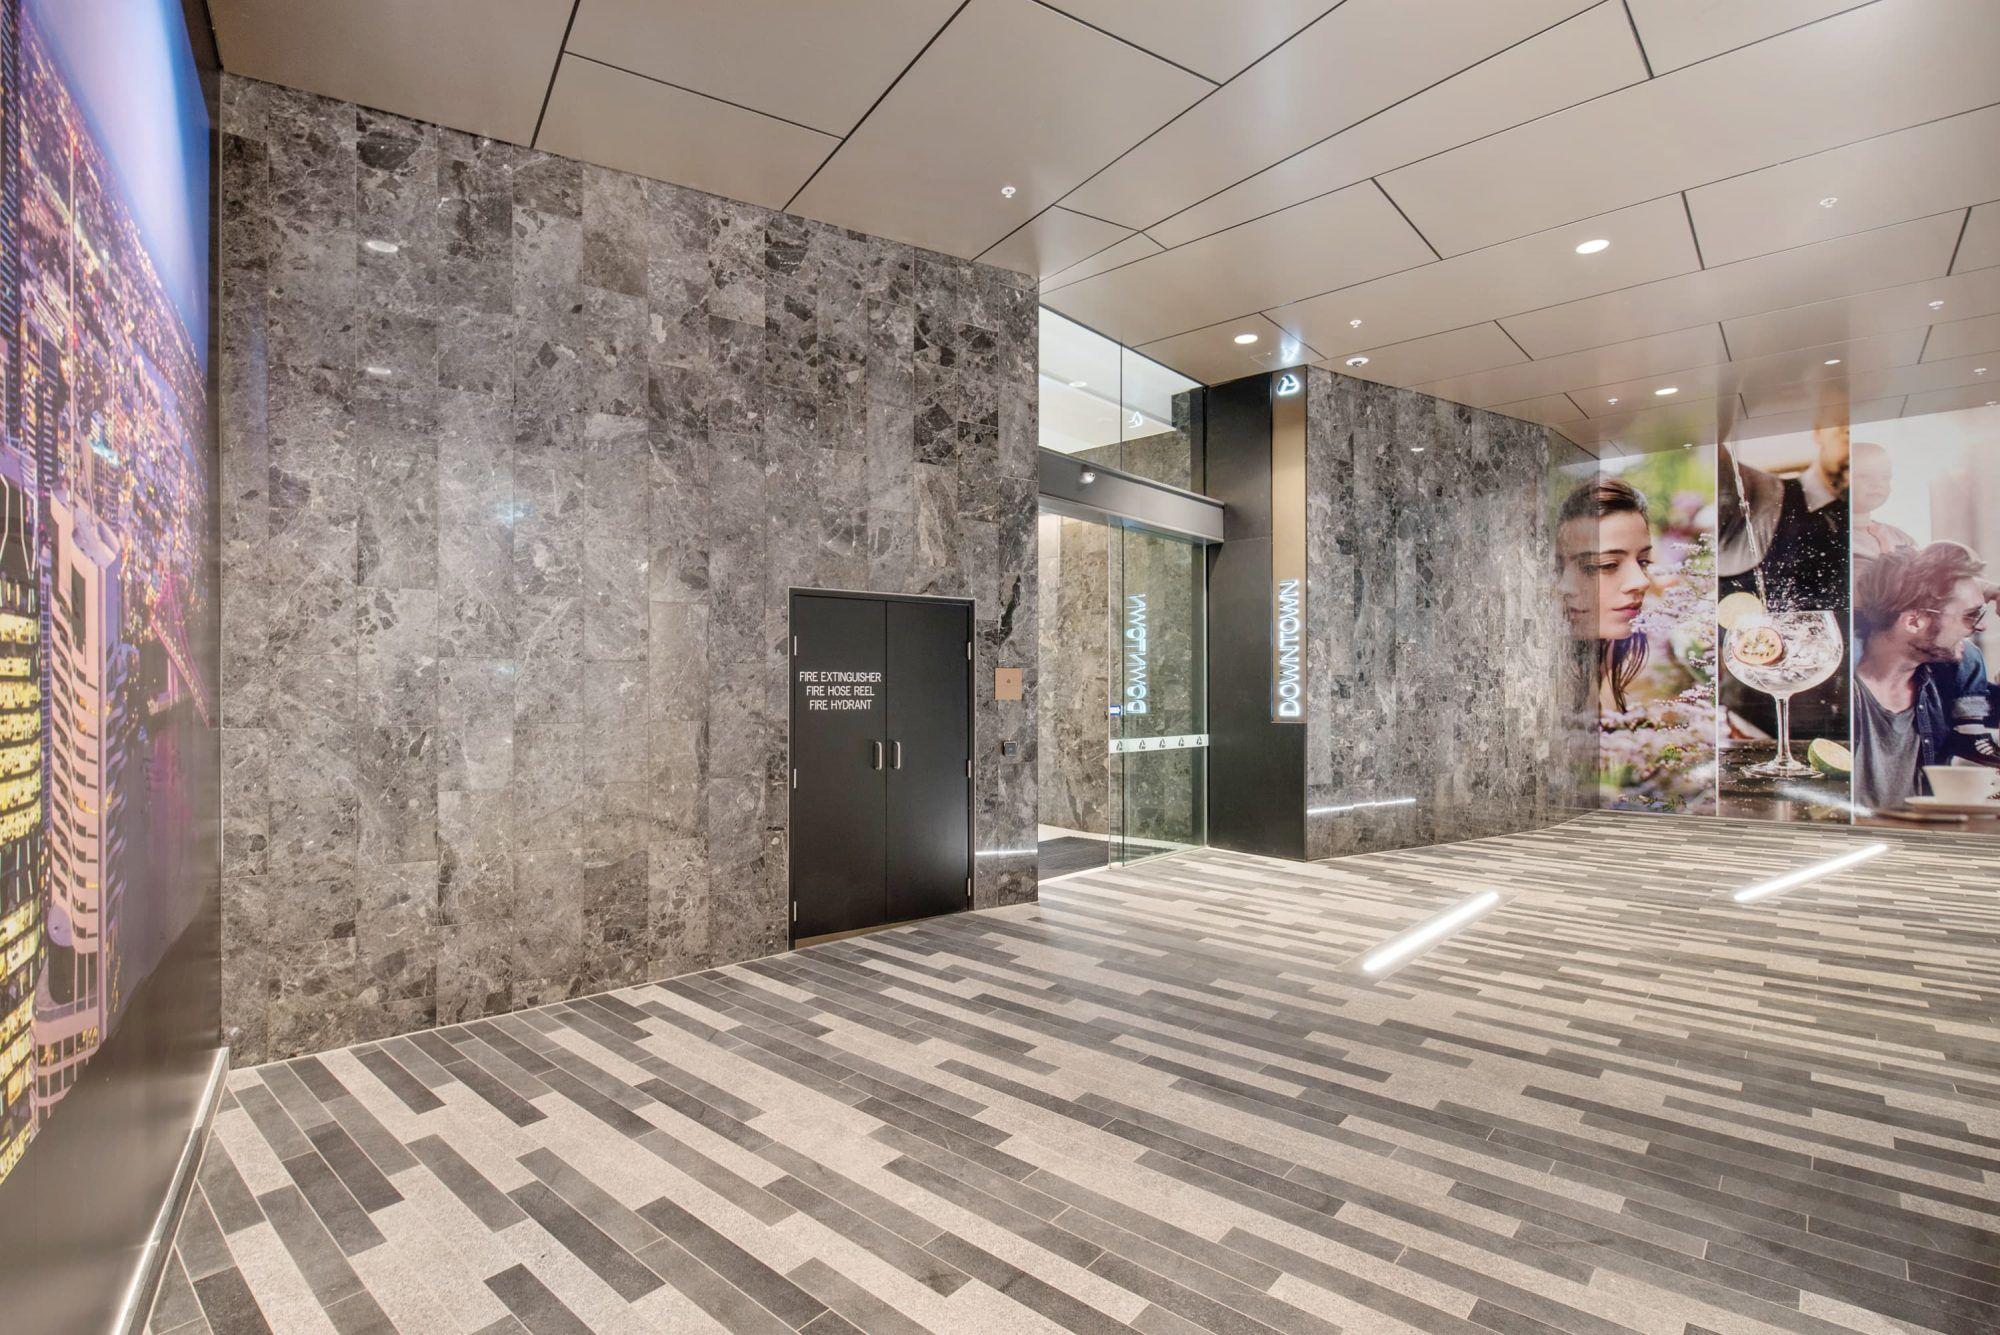 2 Bedroom, 1 Bathroom Apartments for Rent in Brisbane City ...